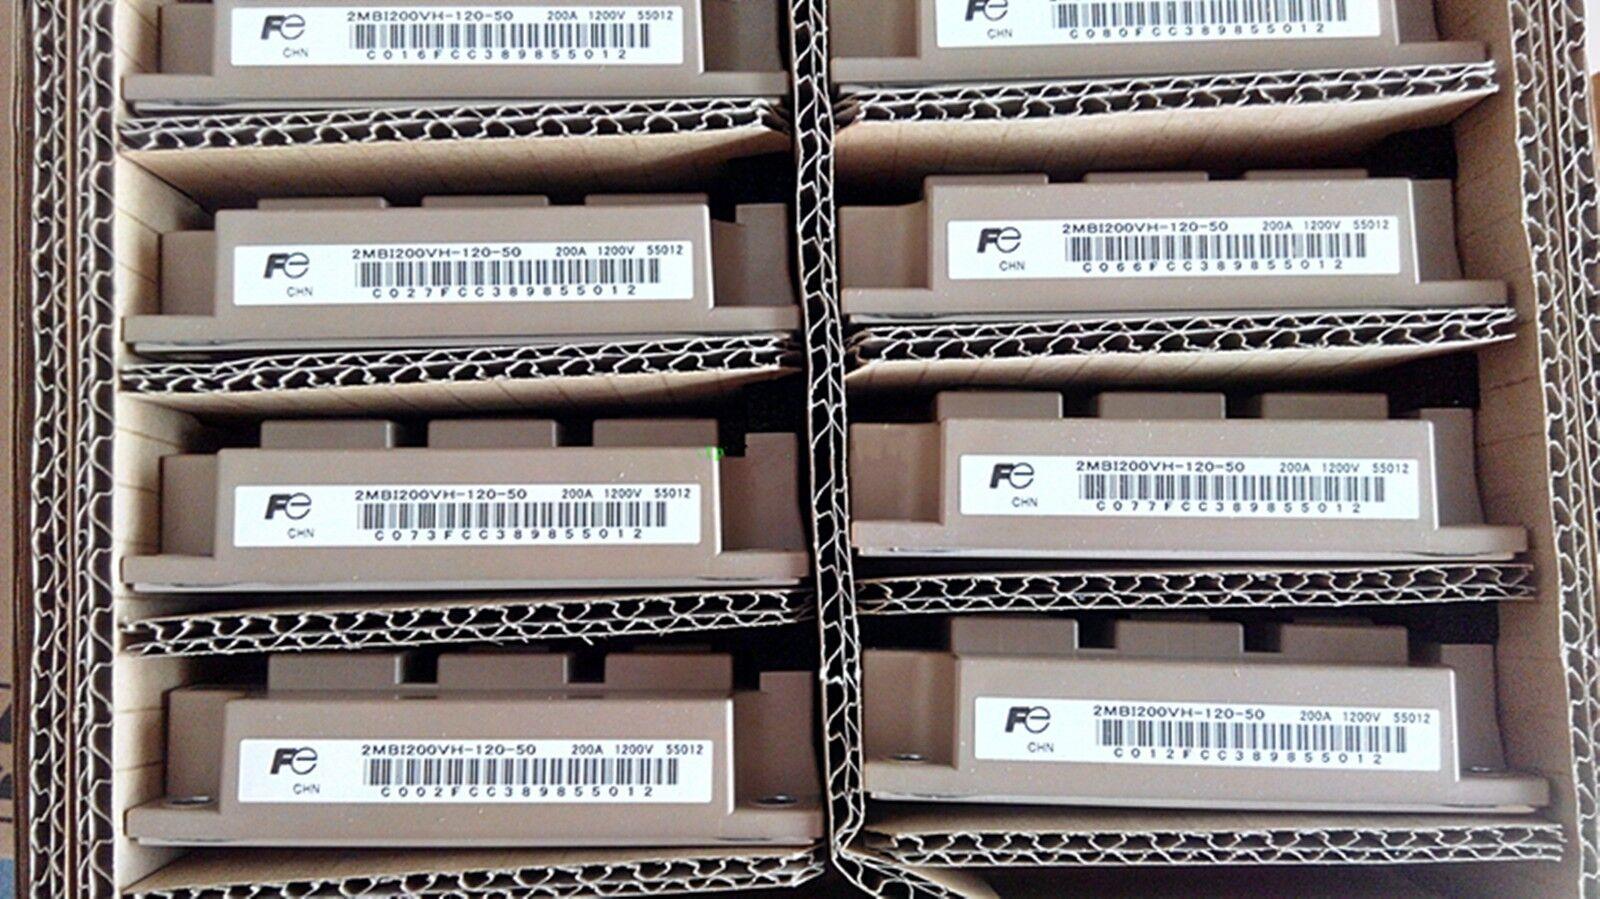 1PC NEW 2MBI200VH-120-50 2MBI200VH120-50 FUJI IGBT MODULE